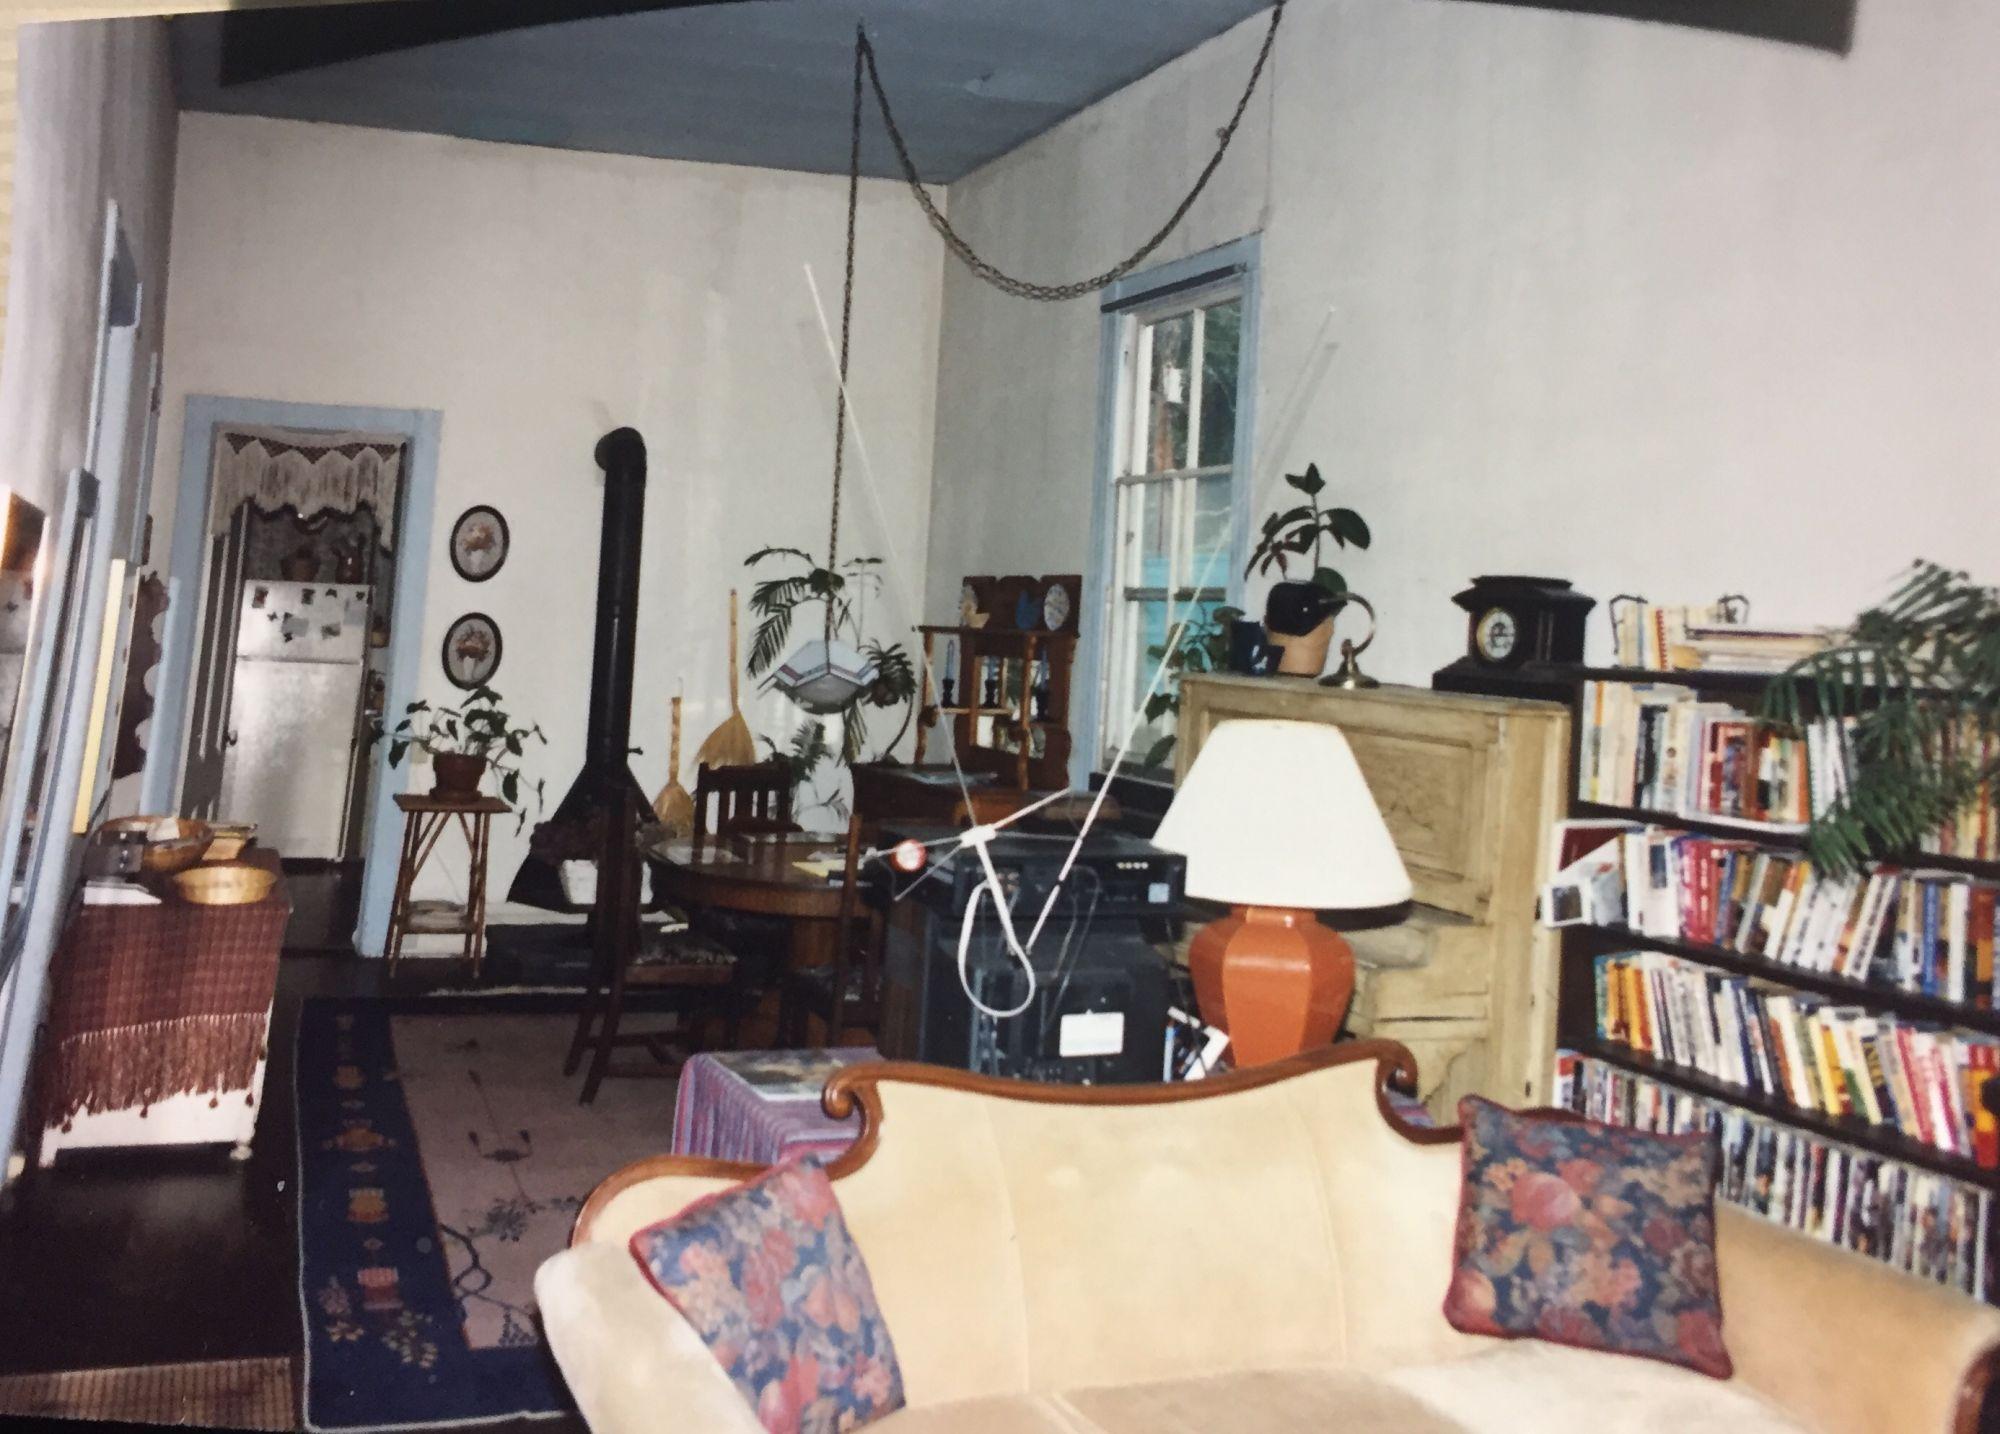 03-Adams-childhood-living-room_1.jpg